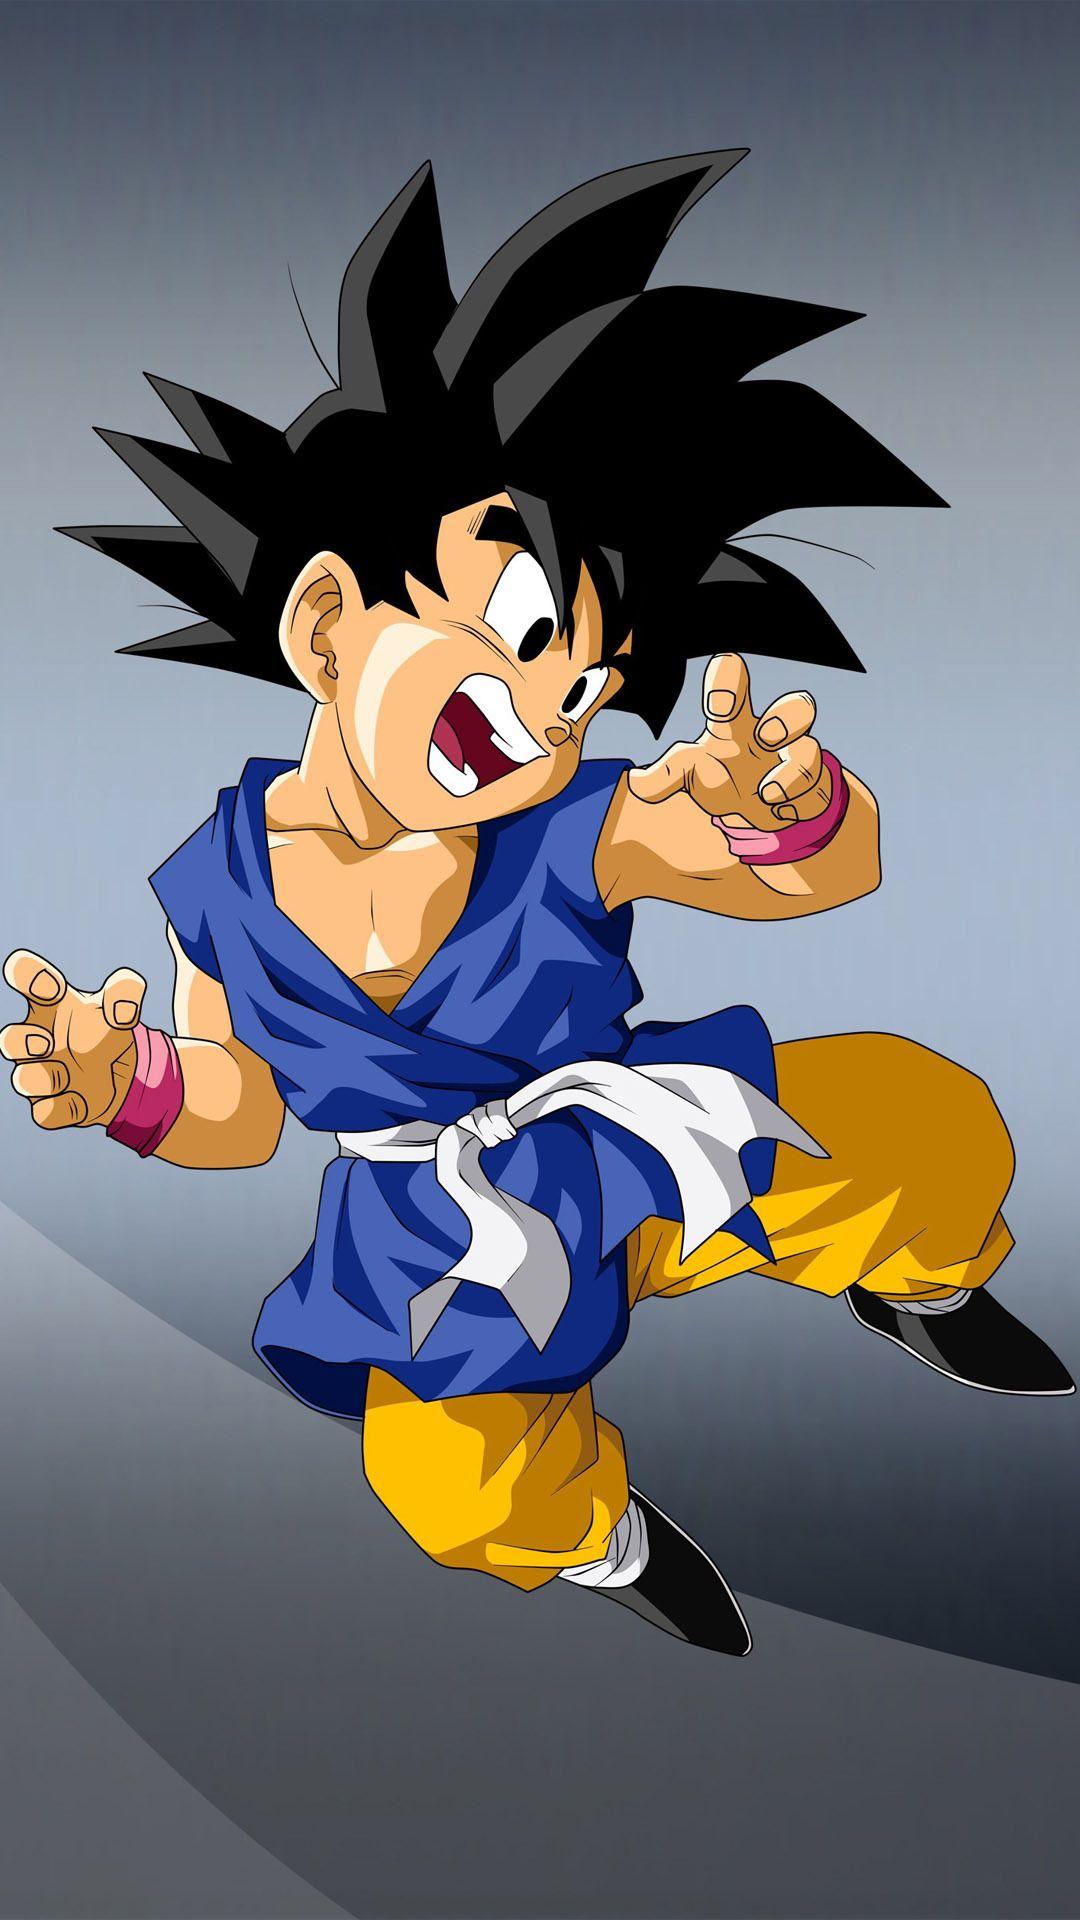 Kid Goku Wallpapers Group